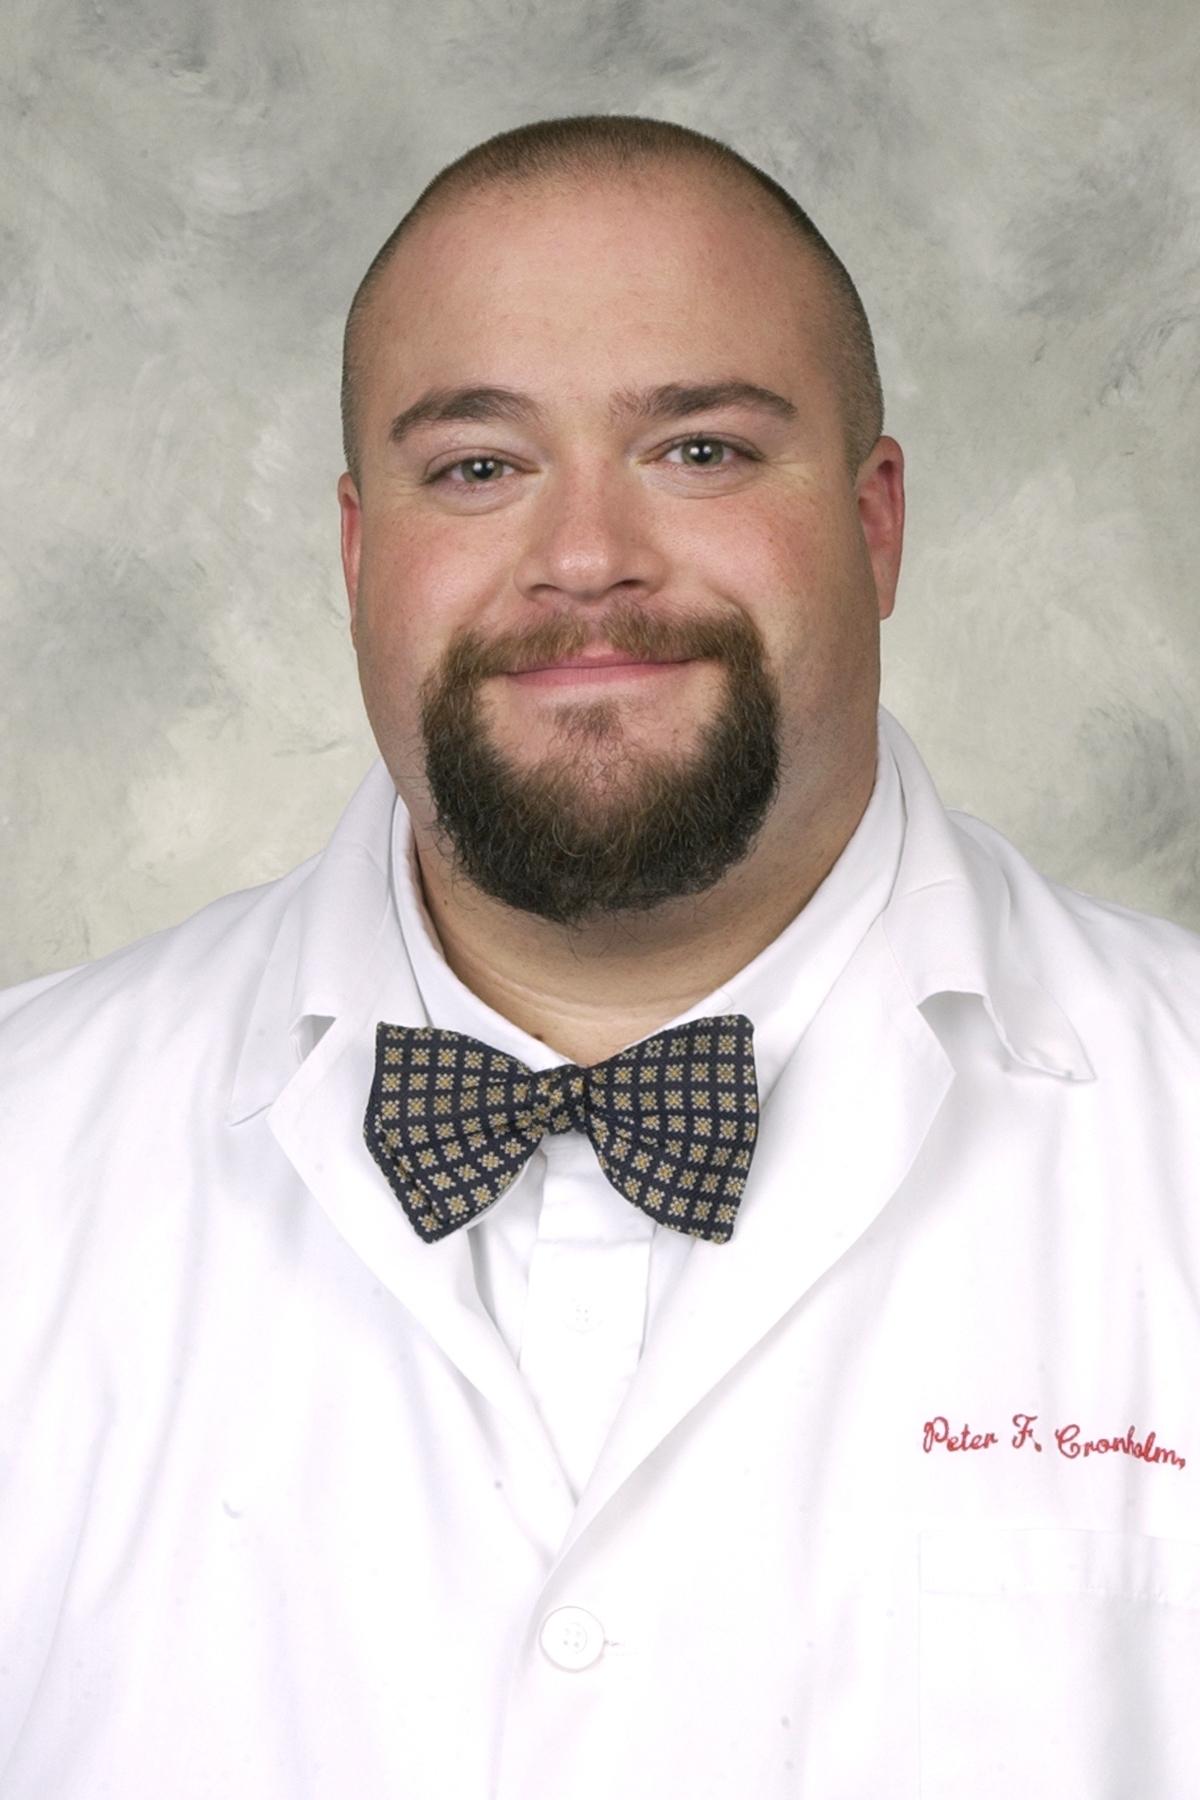 Peter Cronholm, MD, MSCE, FAAFP